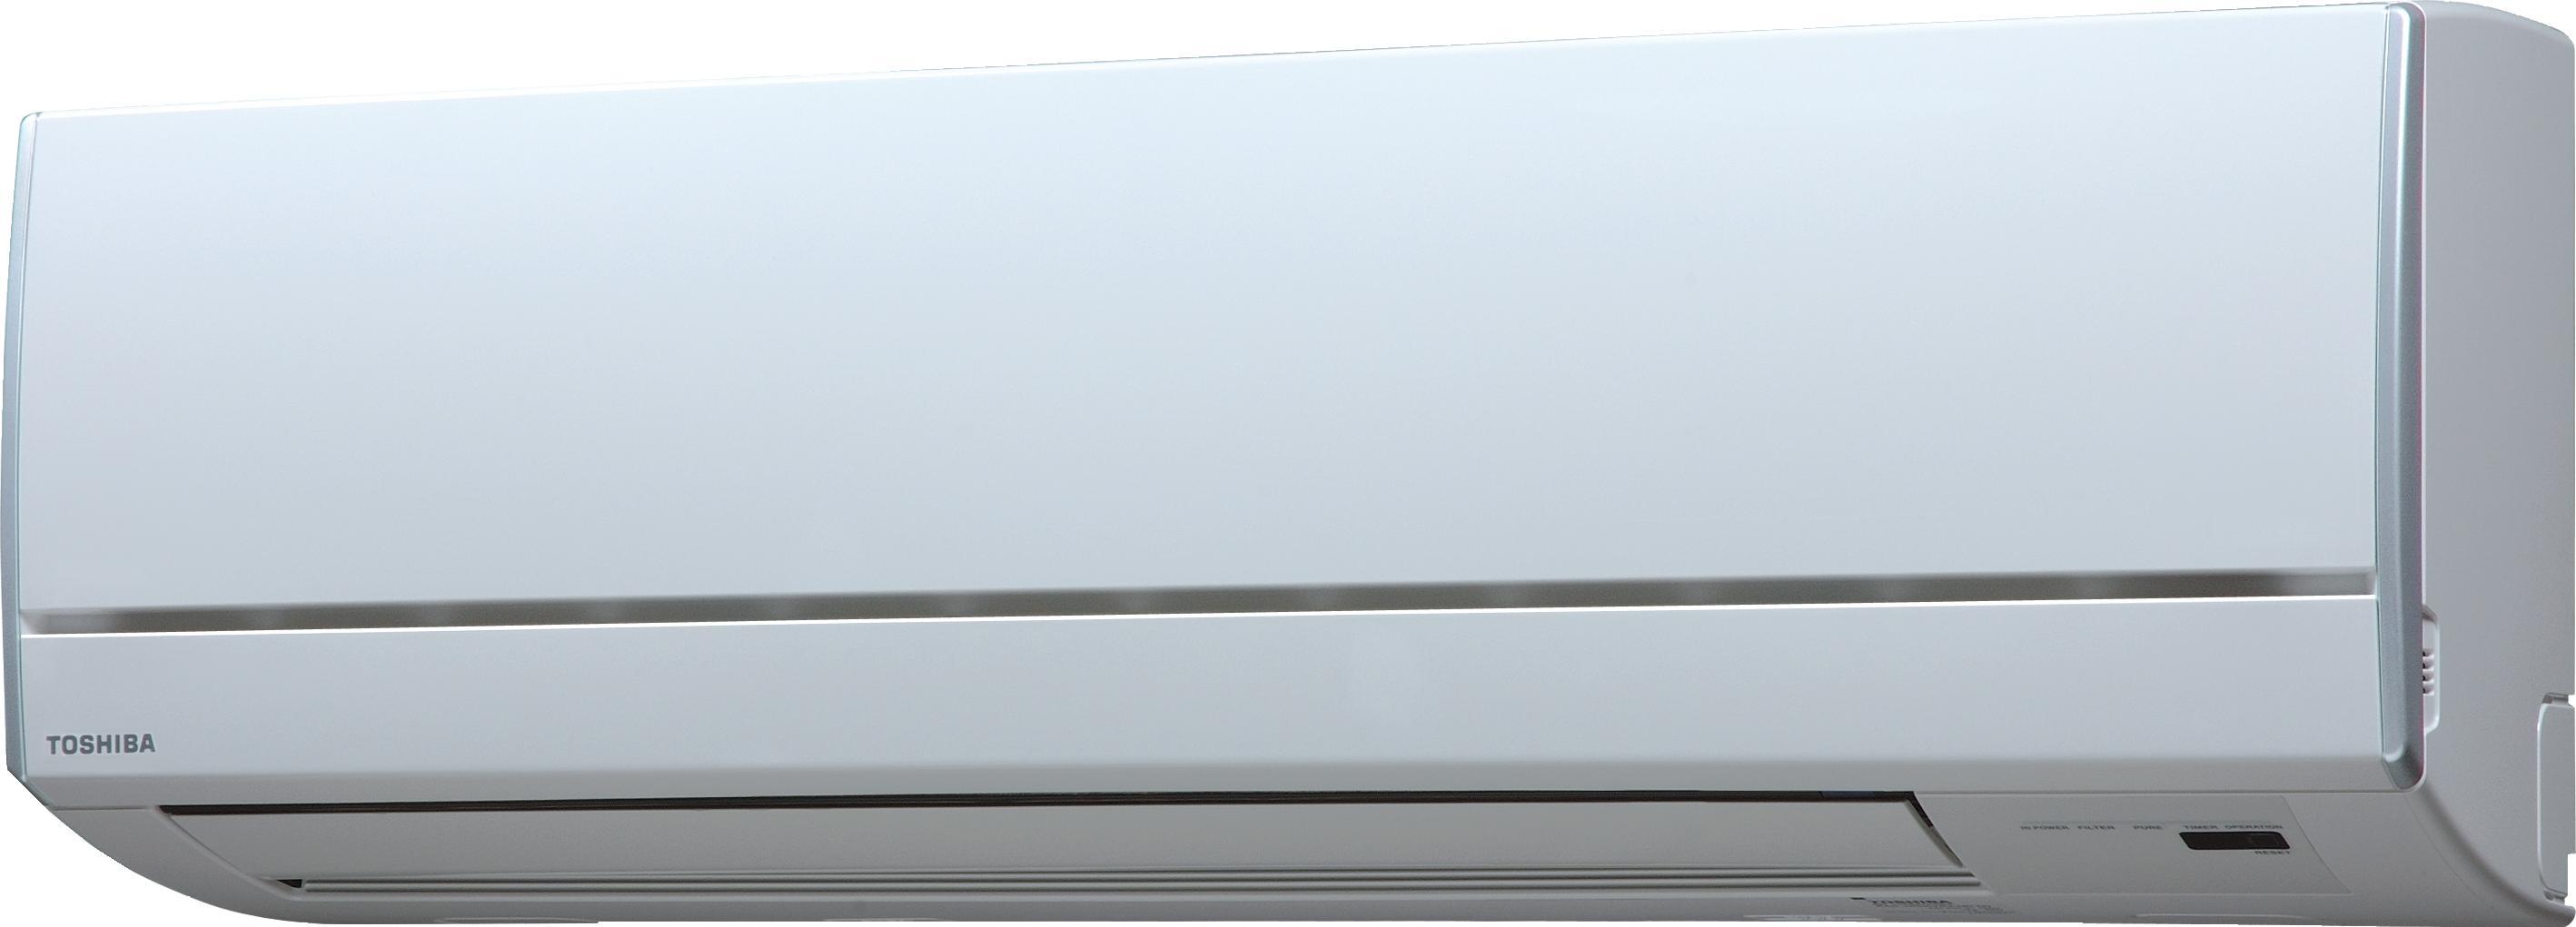 RAS-09SAX-1